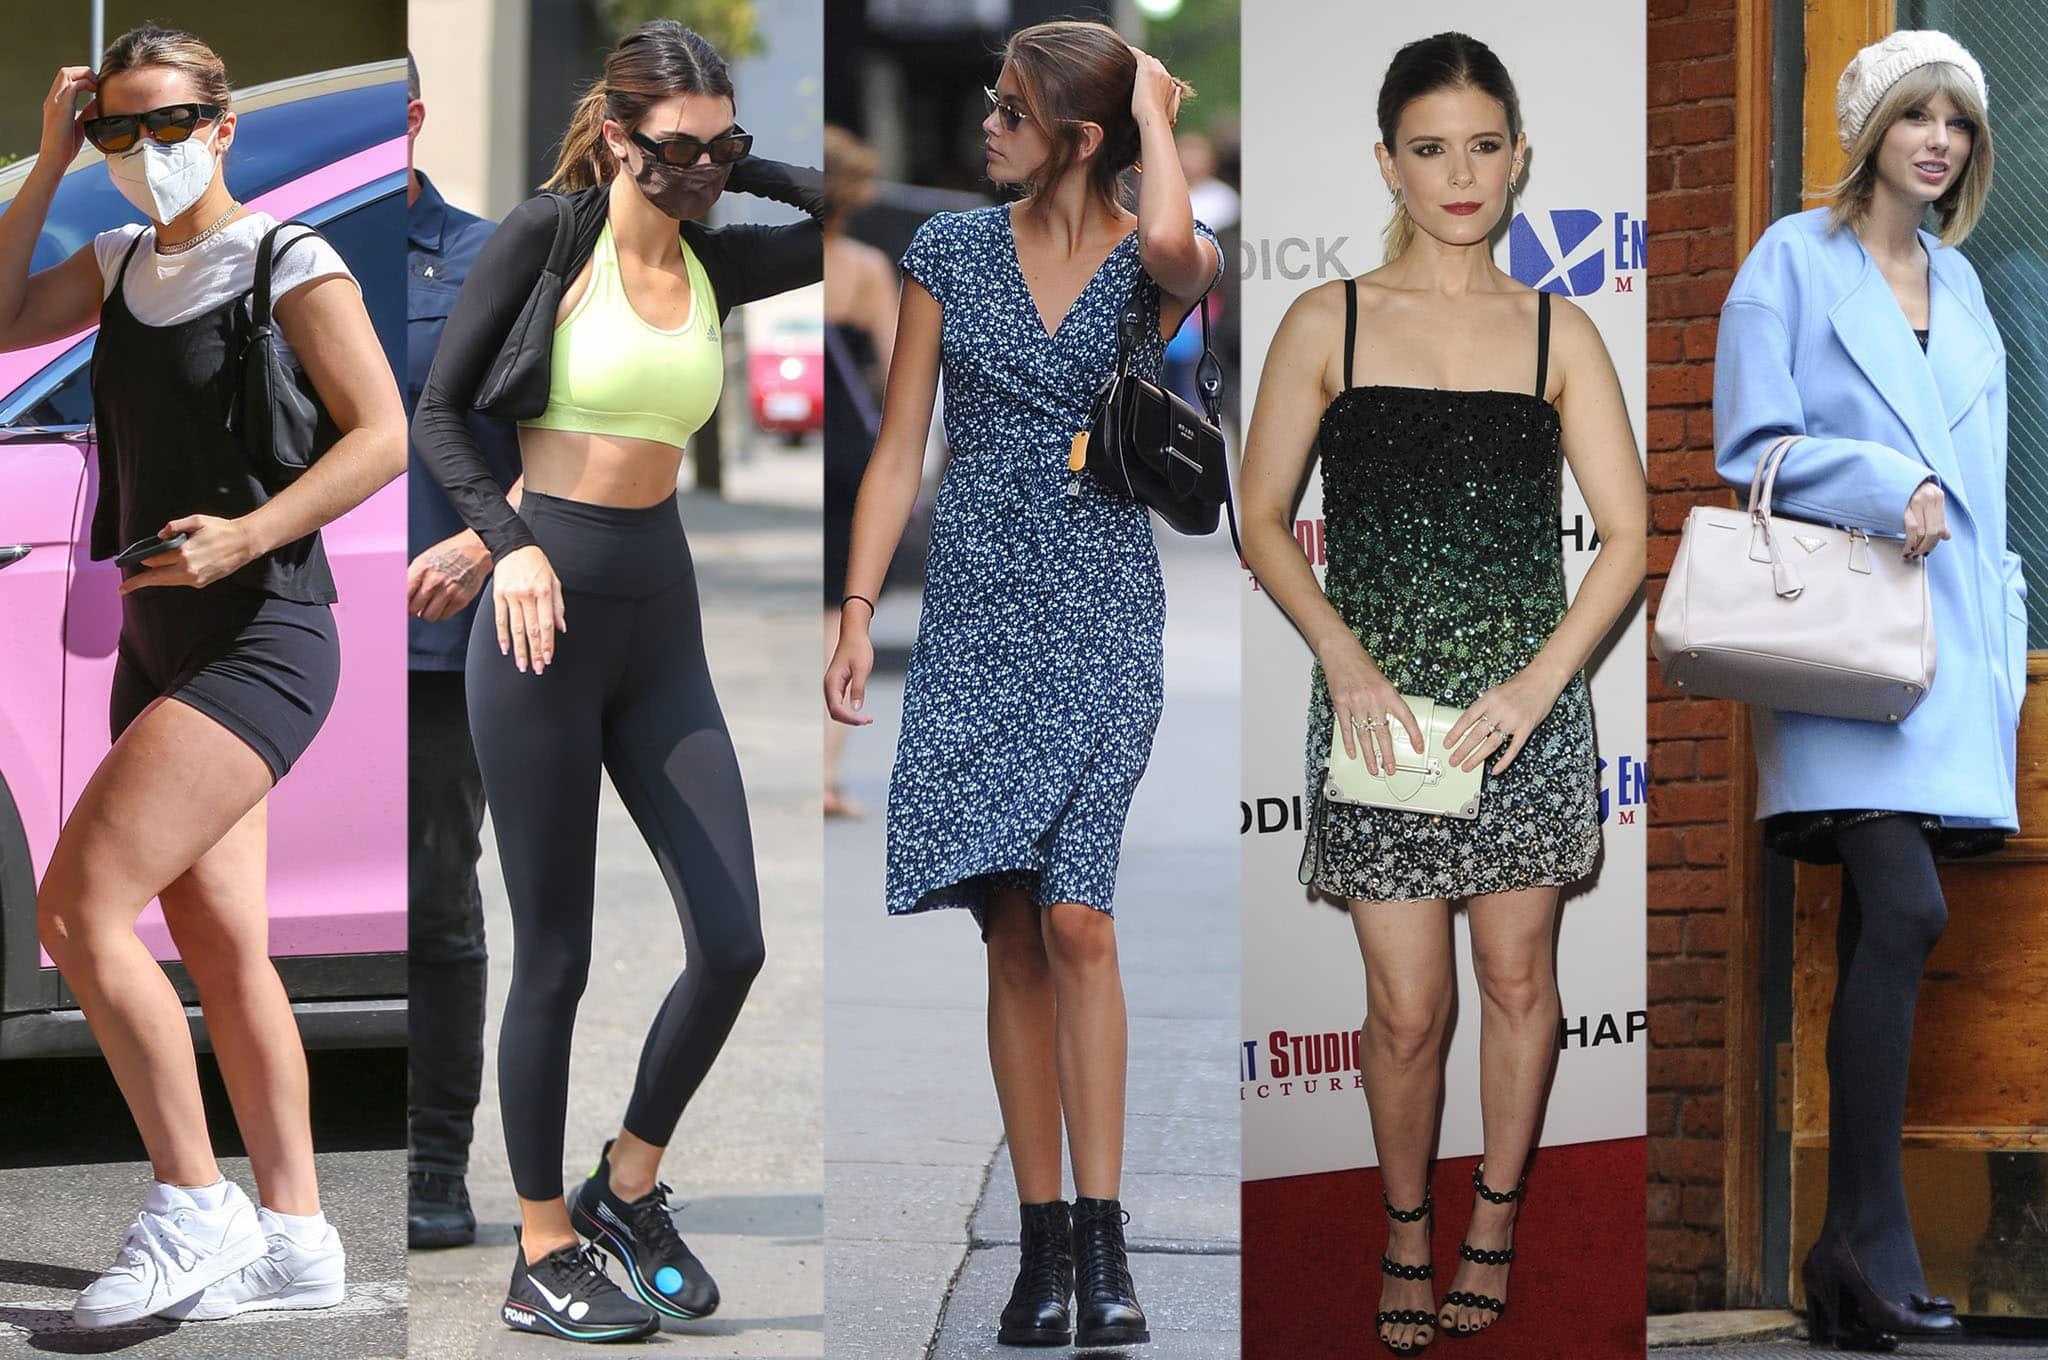 Addison Rae, Kendall Jenner, Kaia Gerber, Kate Mara, and Taylor Swift carrying Prada bags